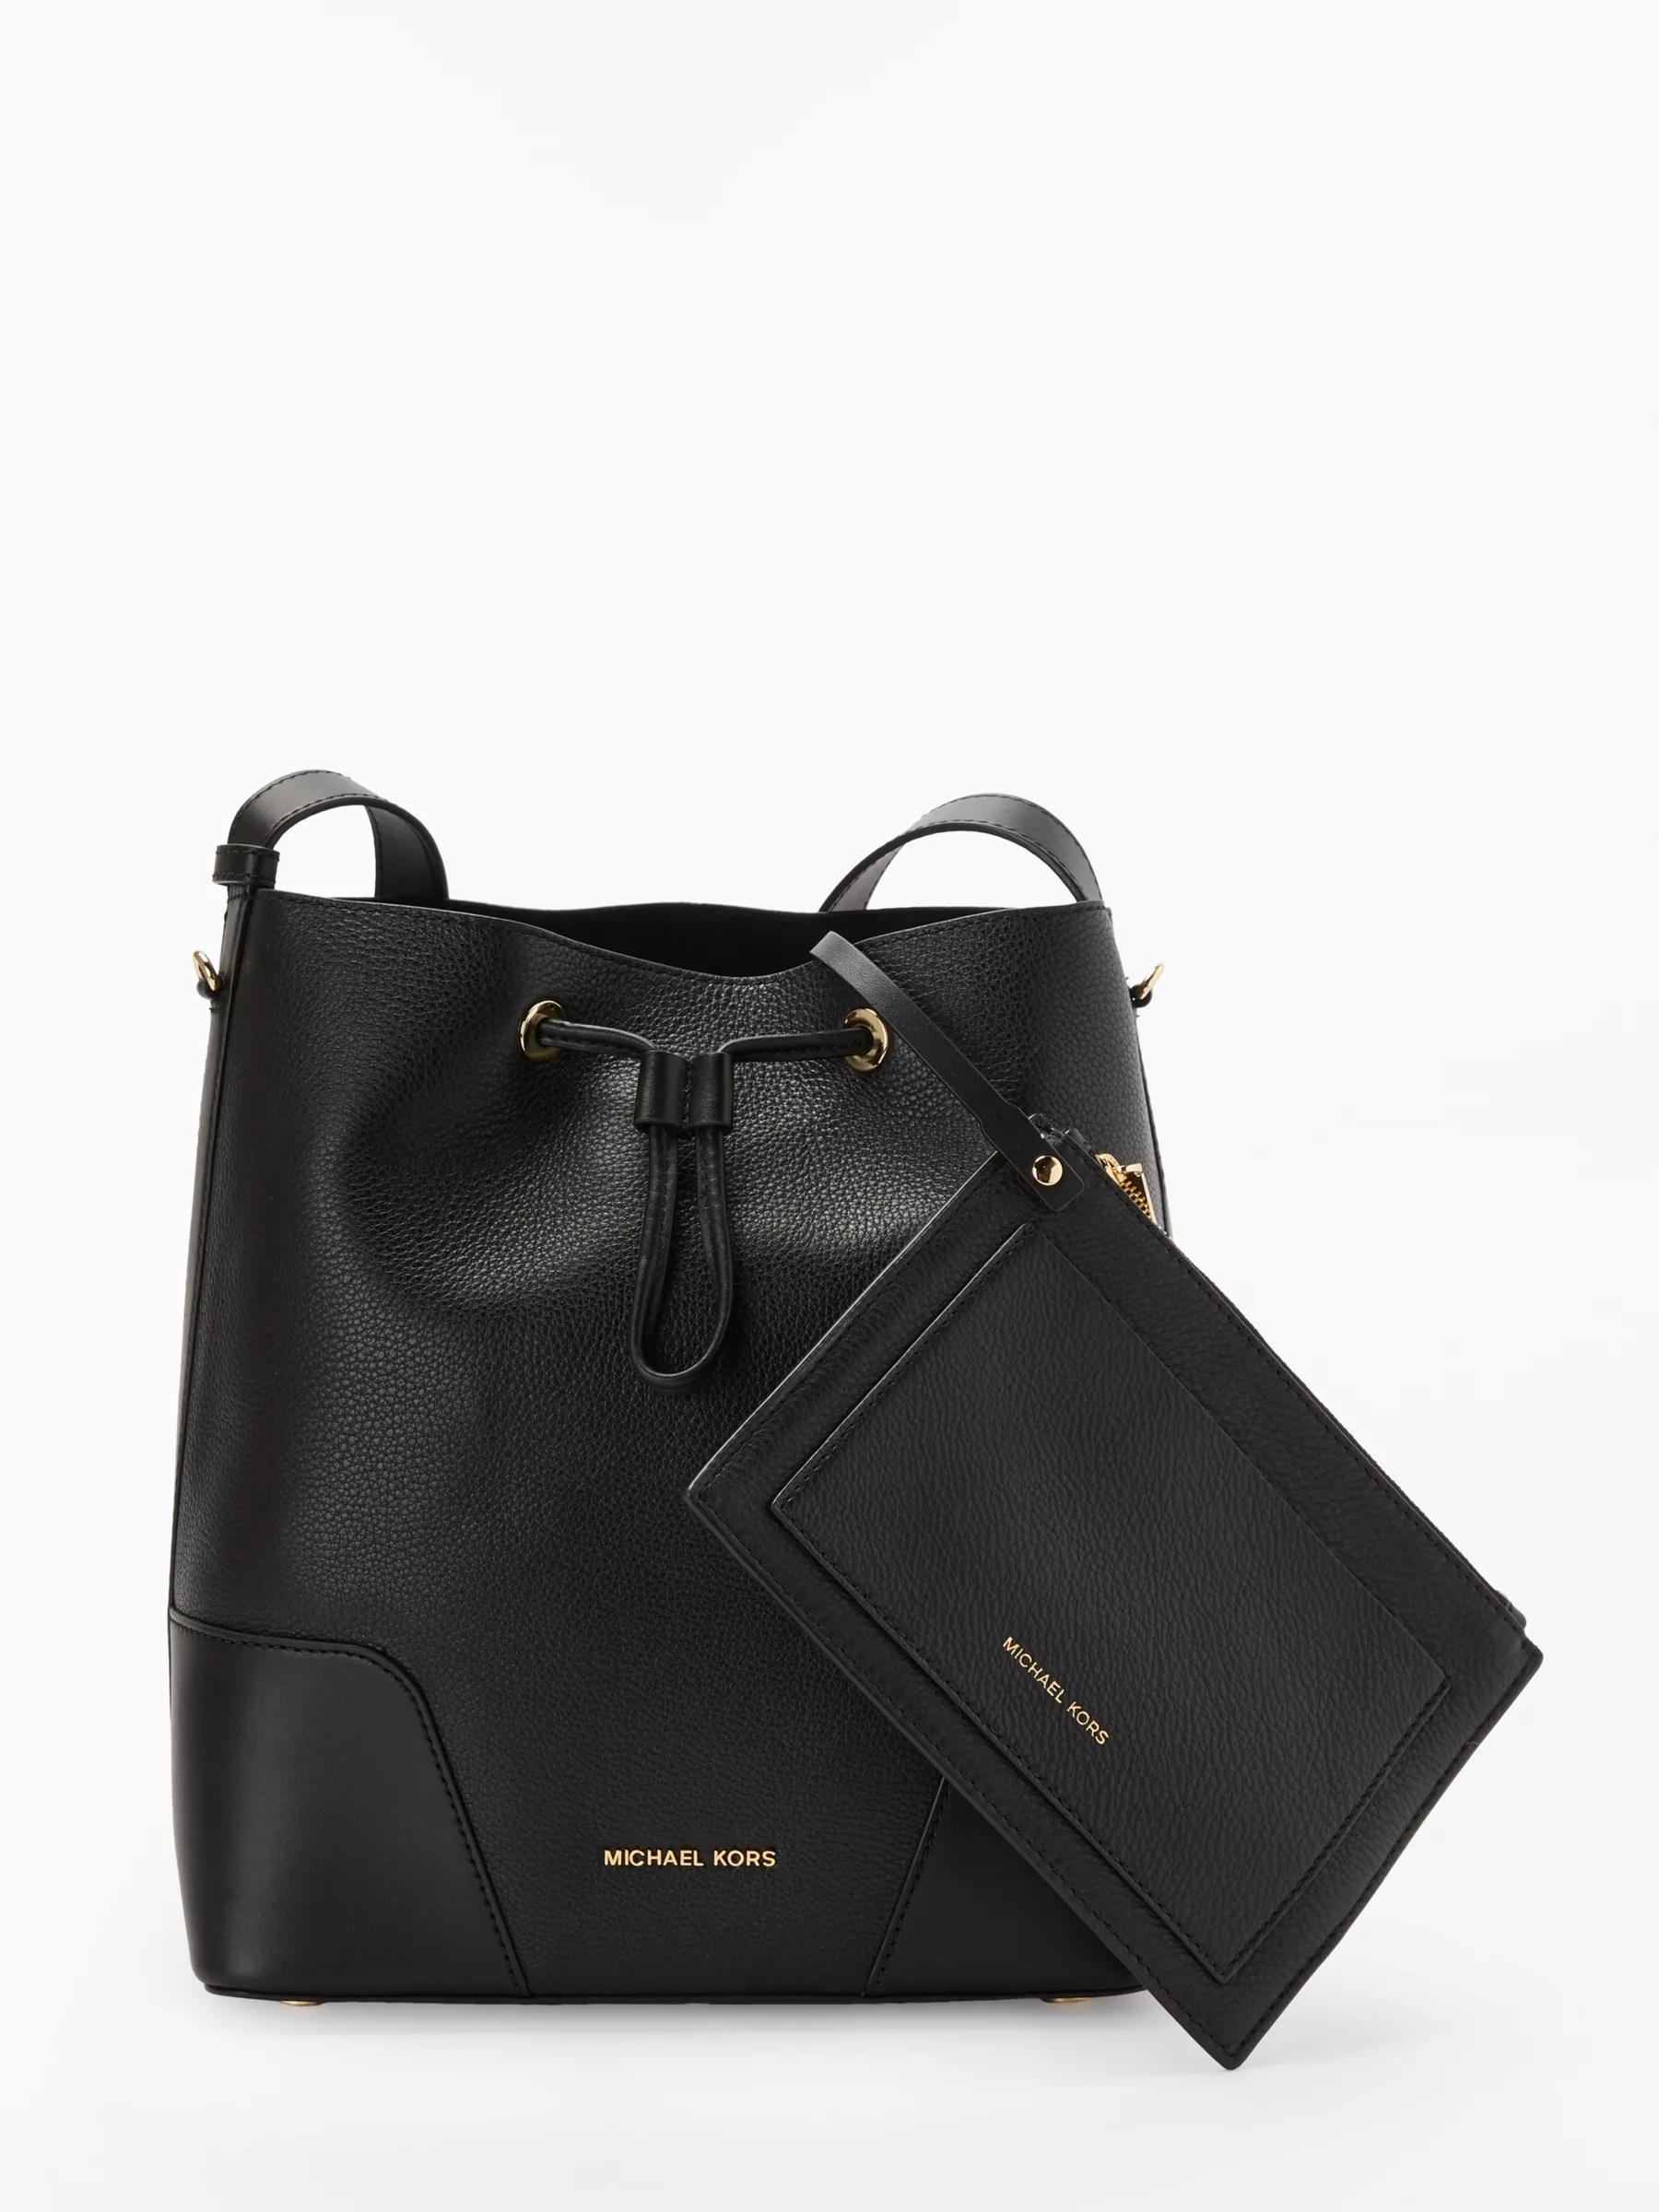 Michael Kors Cary Medium Leather Bucket Bag